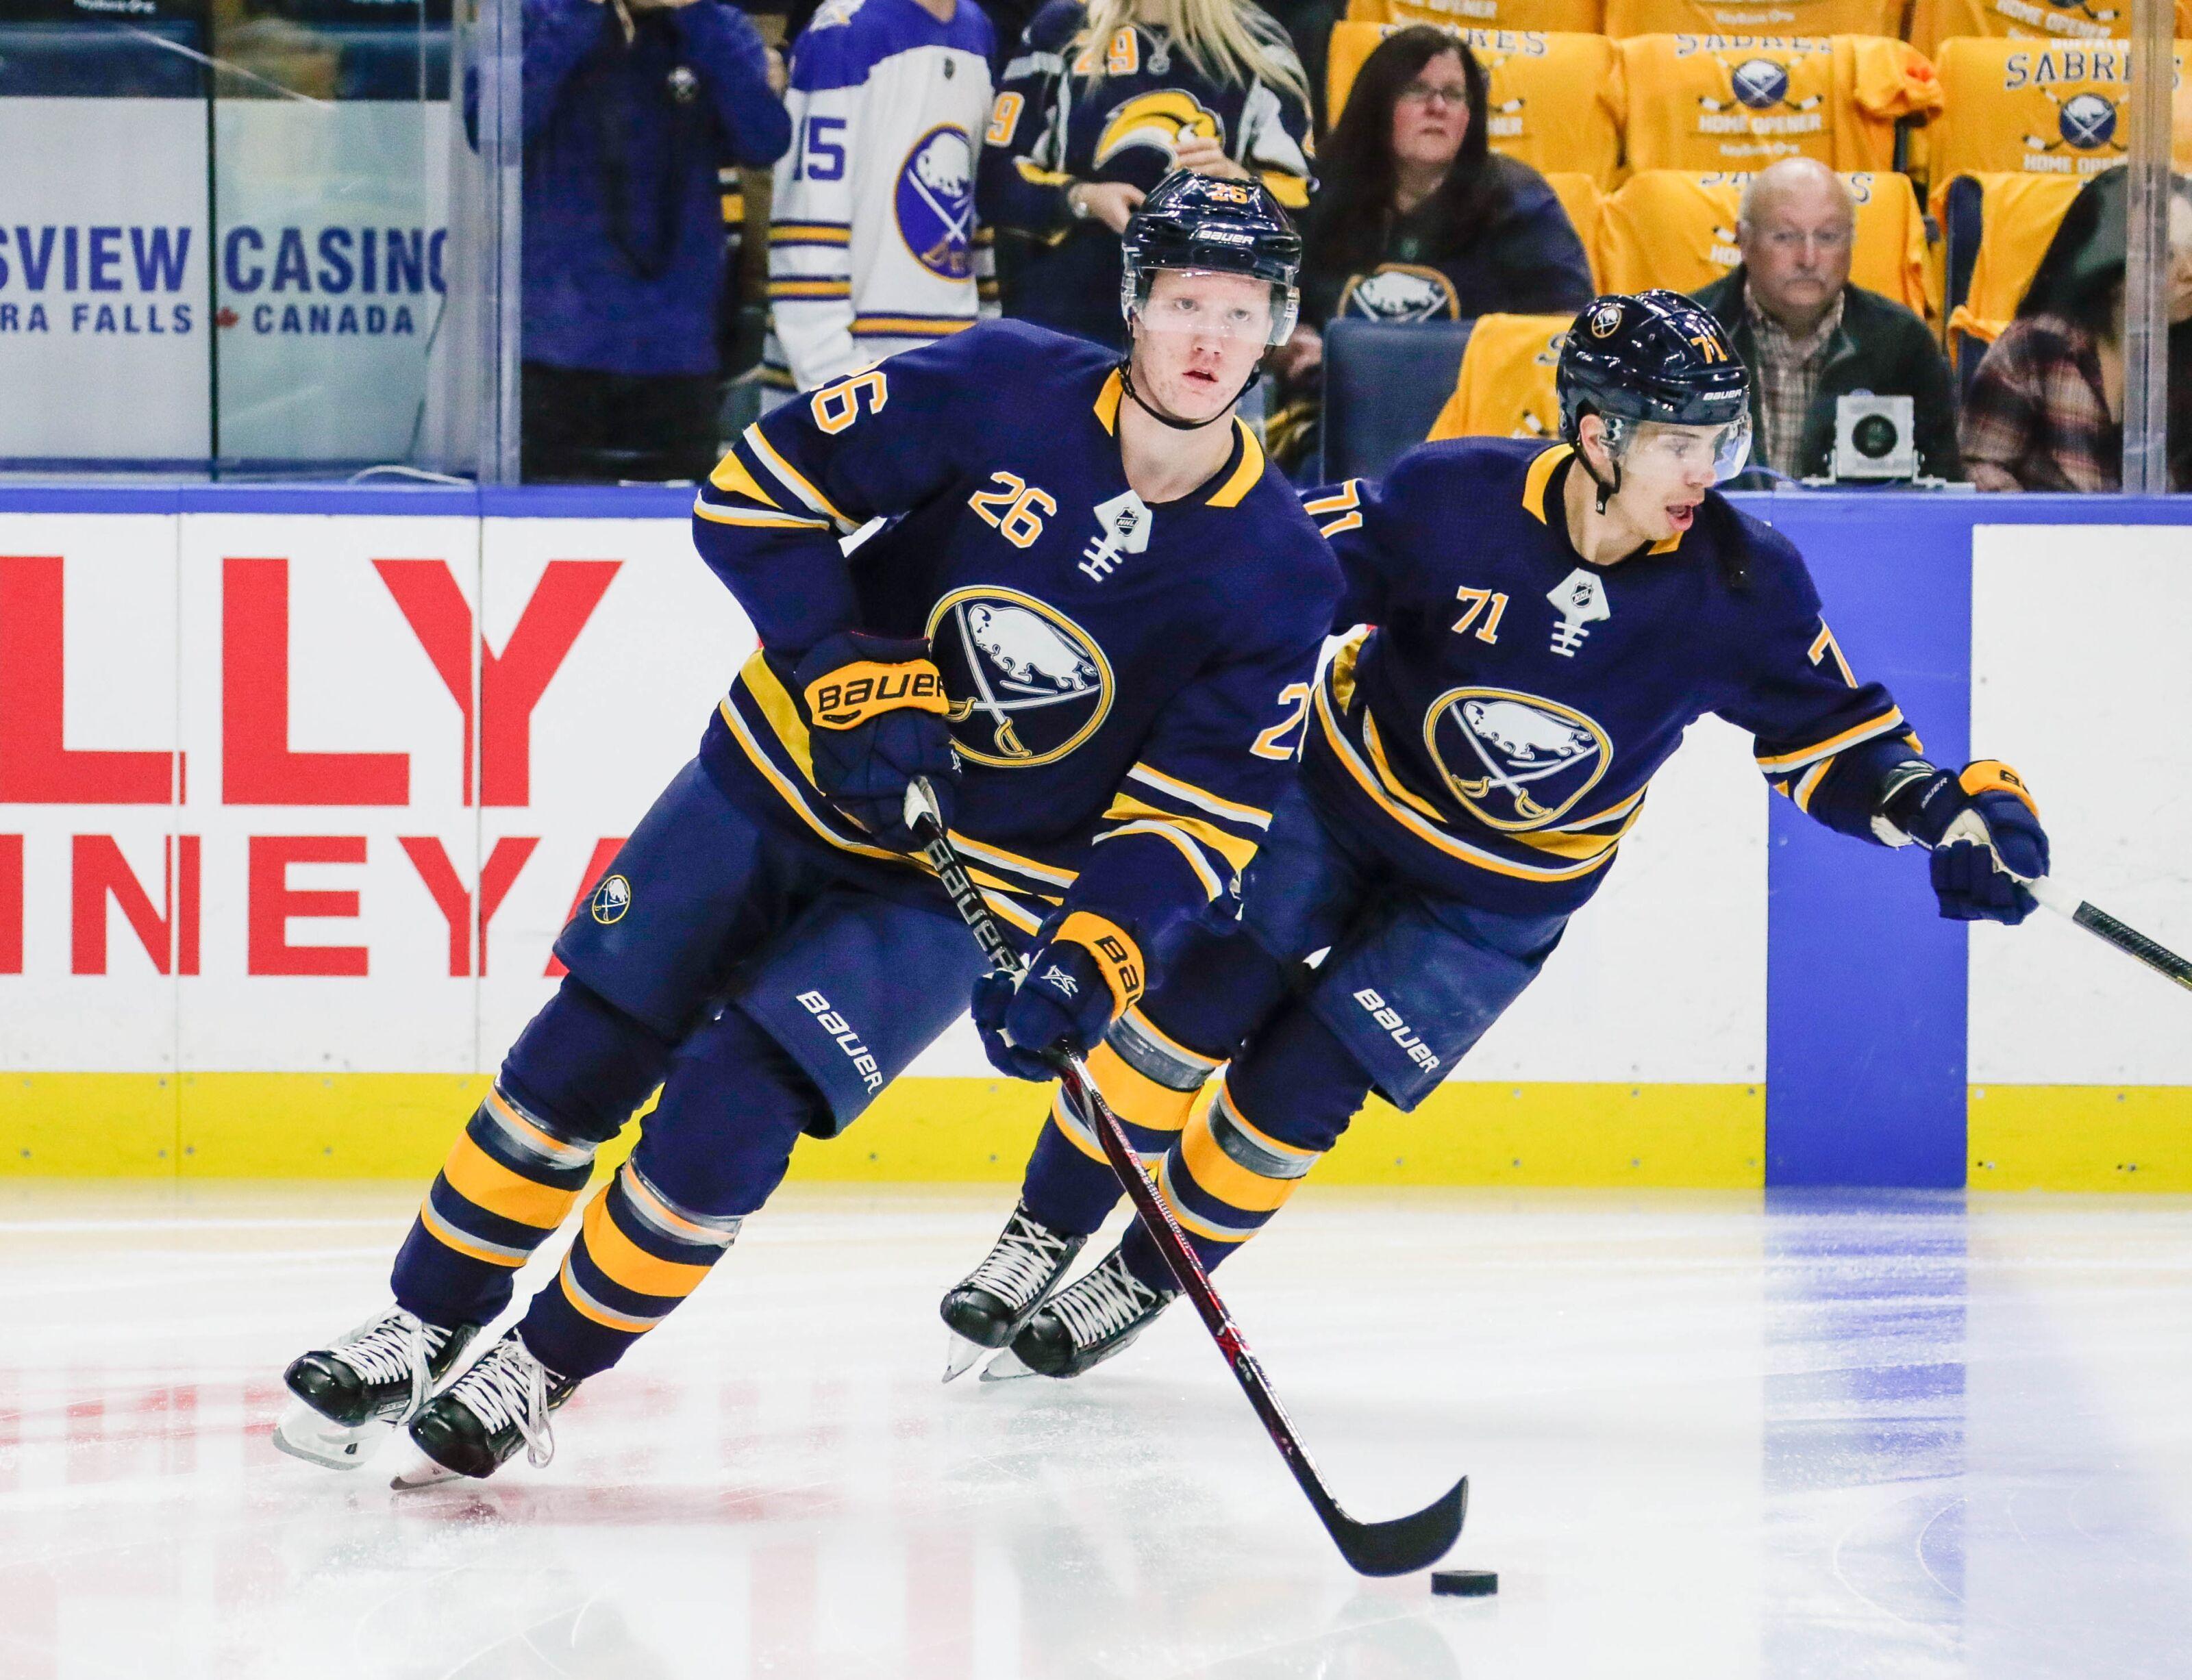 Buffalo Sabres: Saturday night hockey against the Rangers